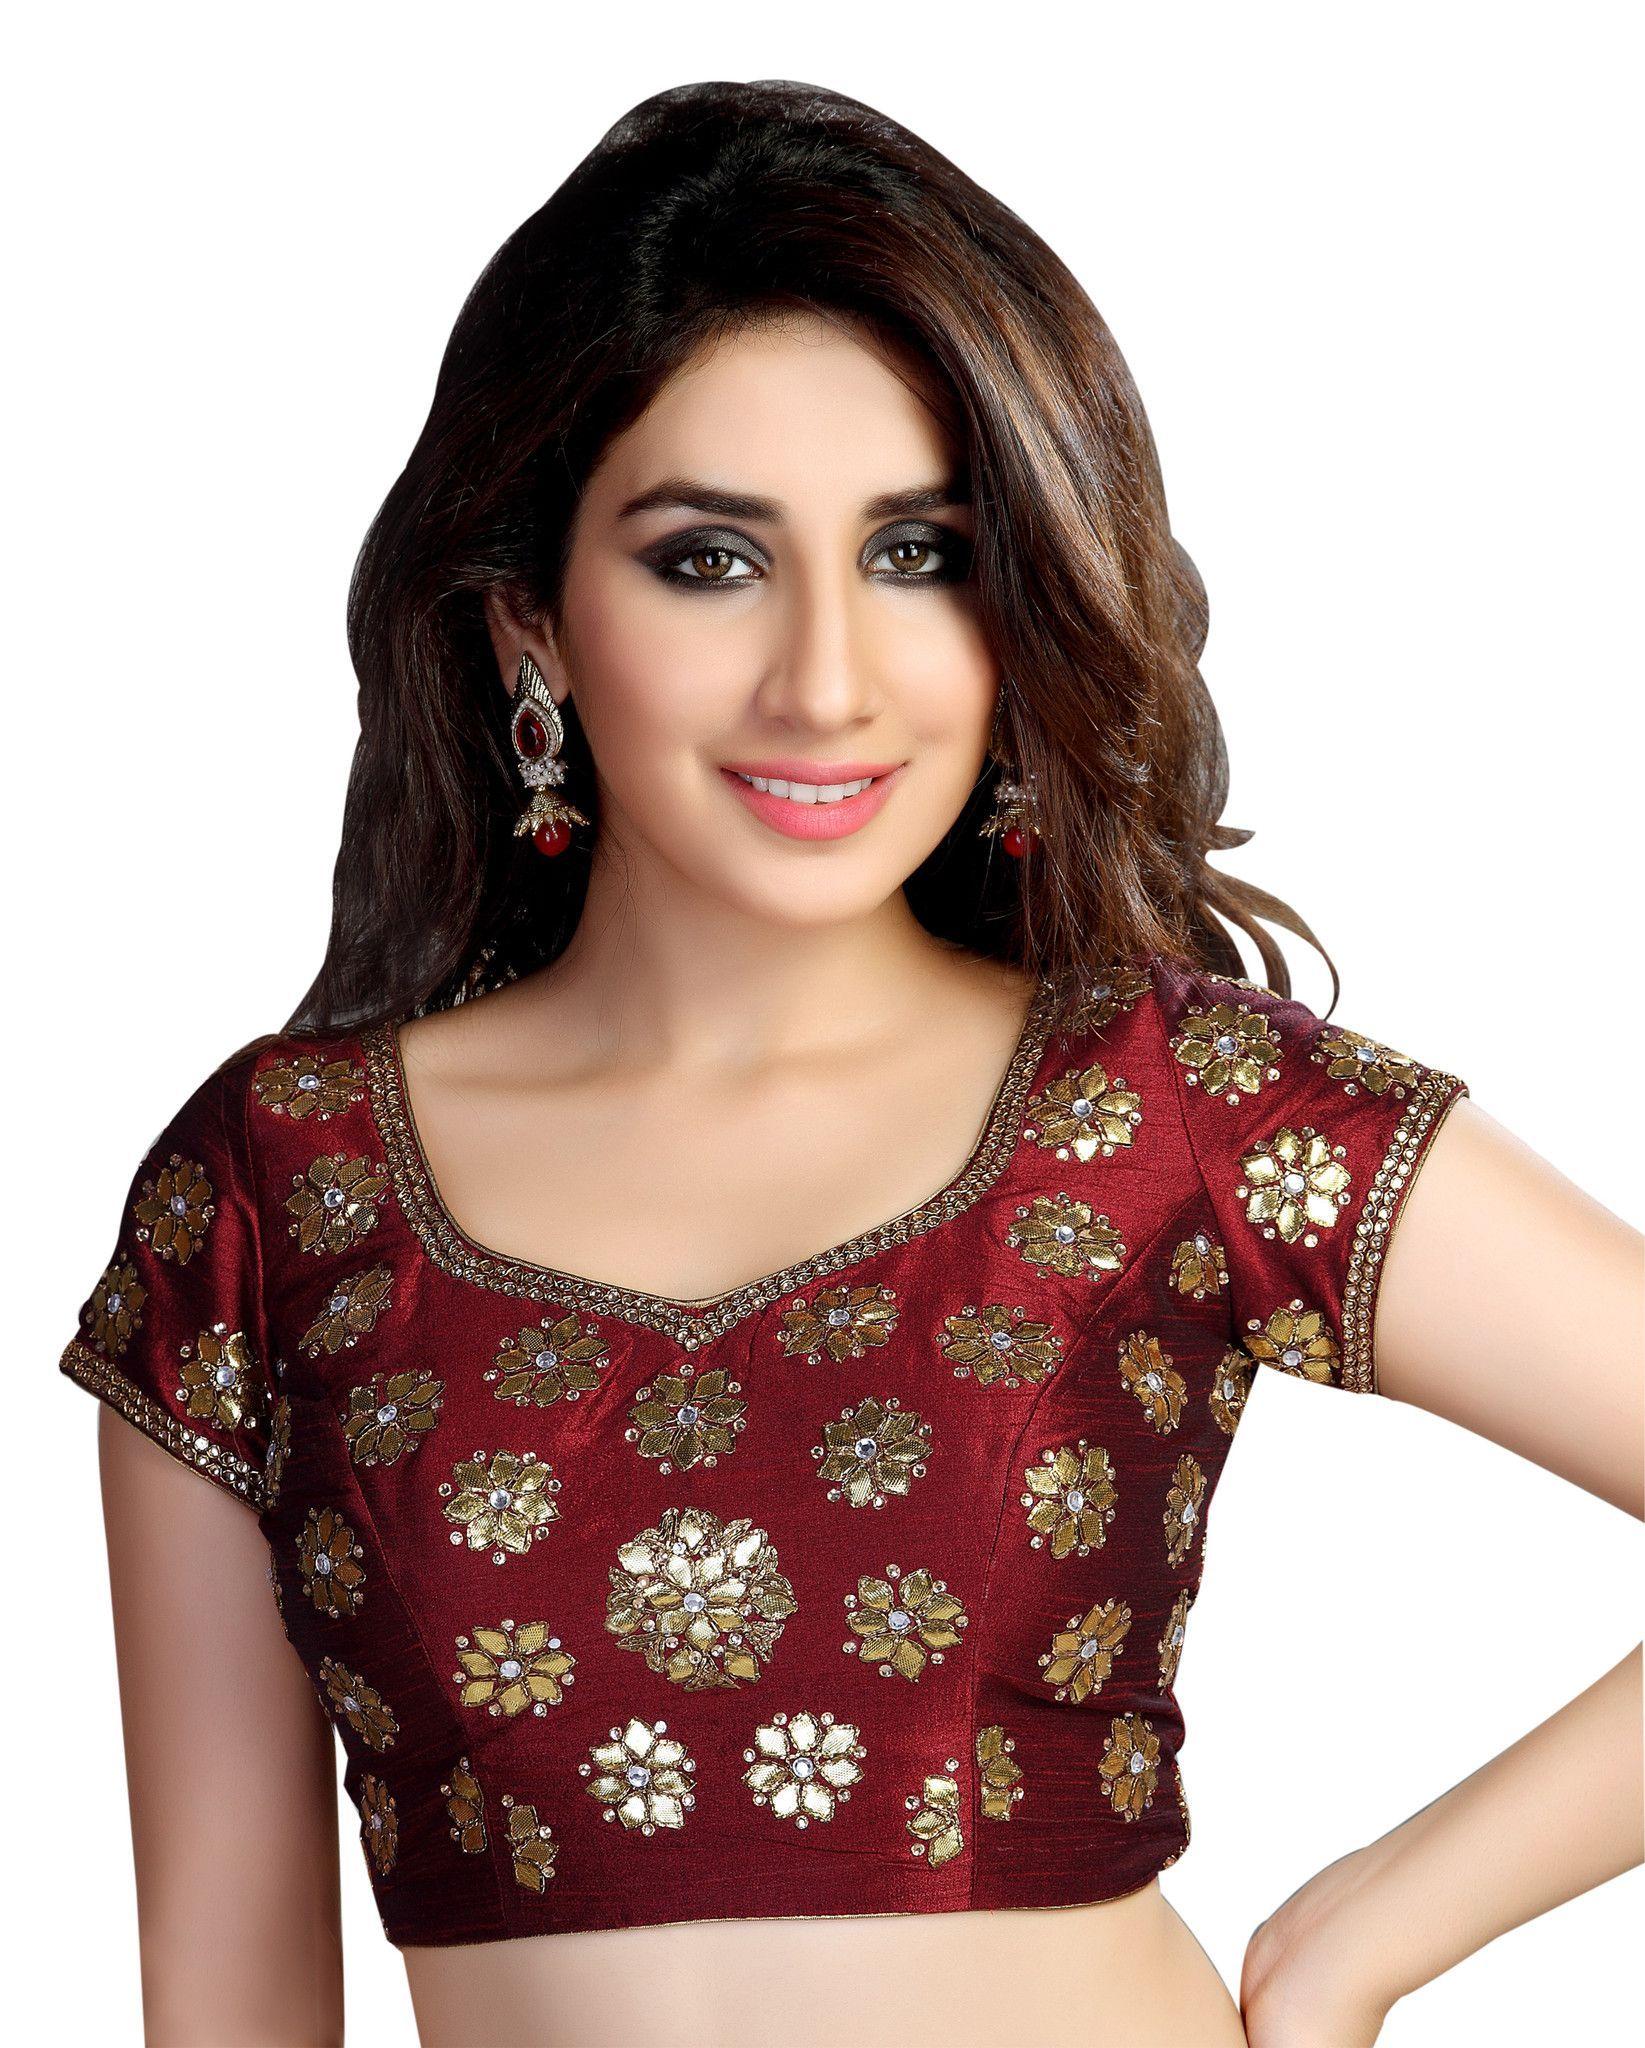 Maroon silk saree floral designed maroon silk saree blouse kp  products